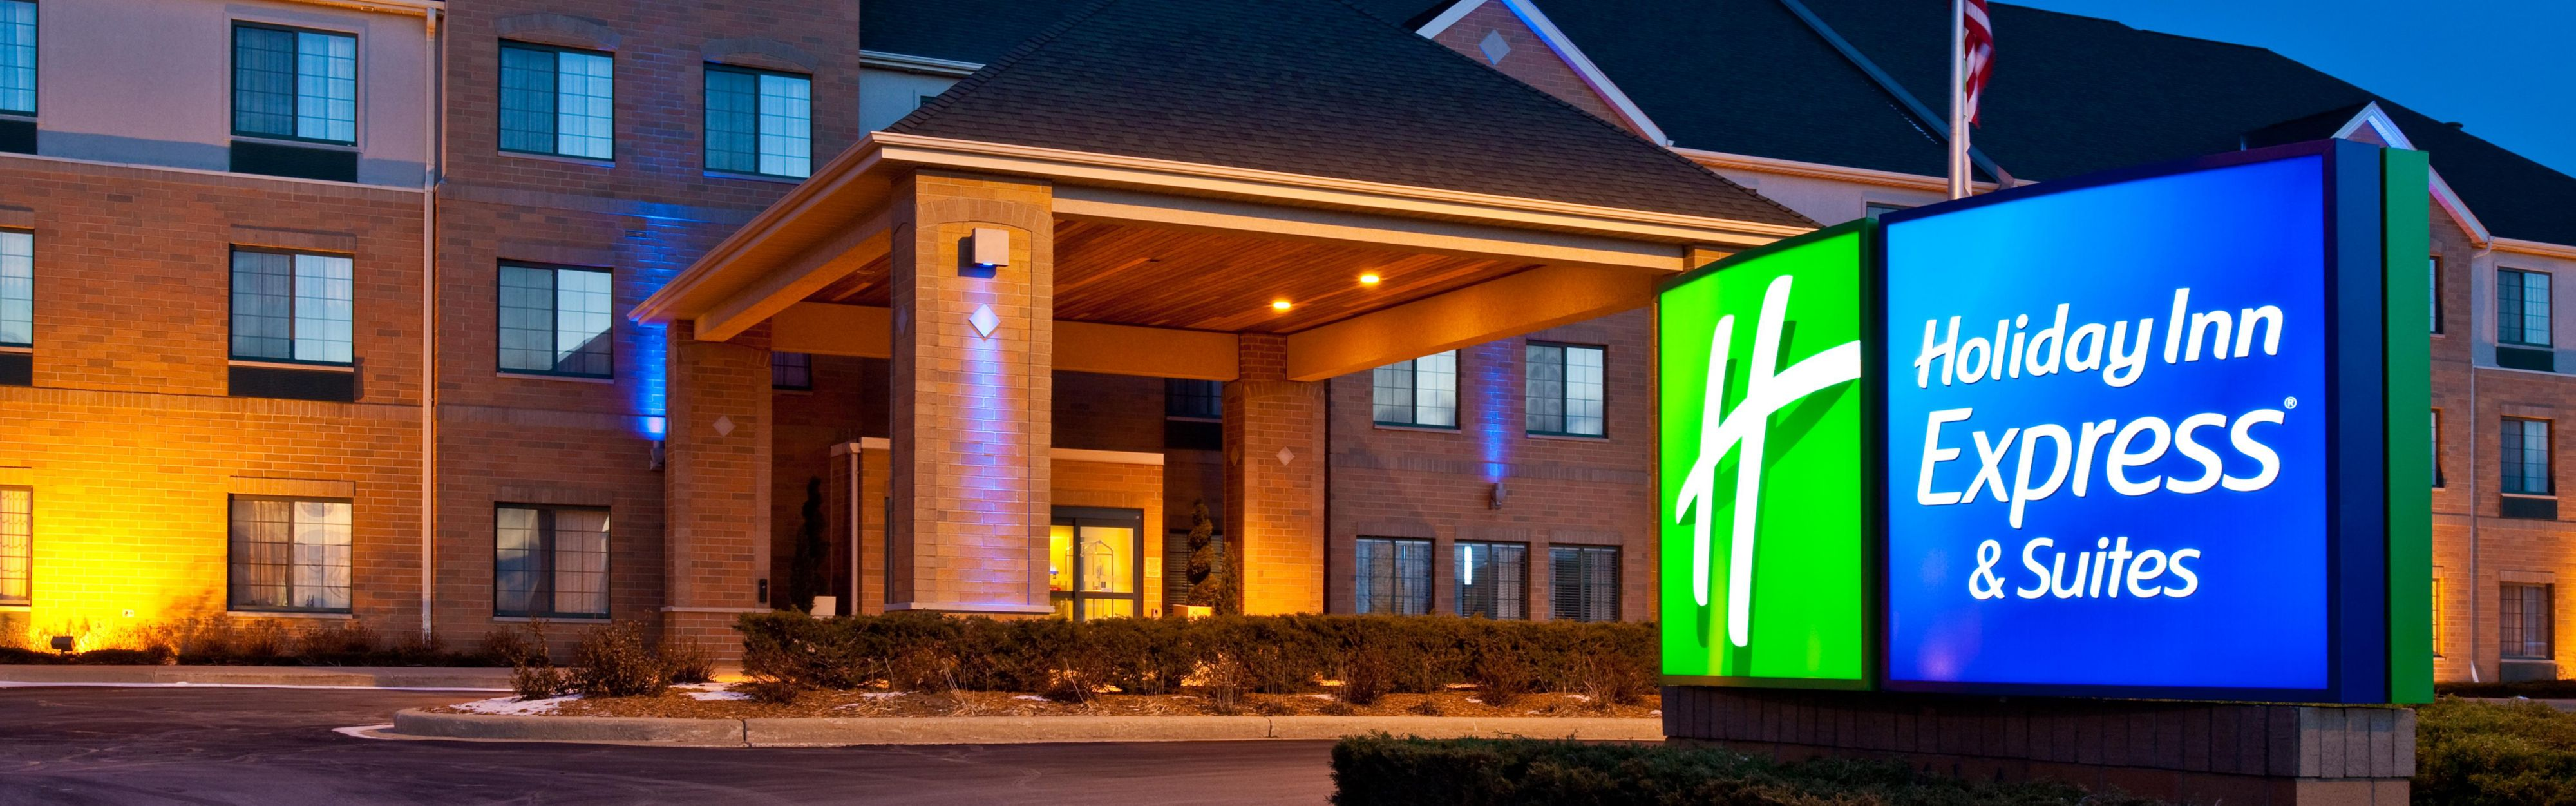 Holiday Inn Express & Suites Pleasant Prairie / Kenosha image 0